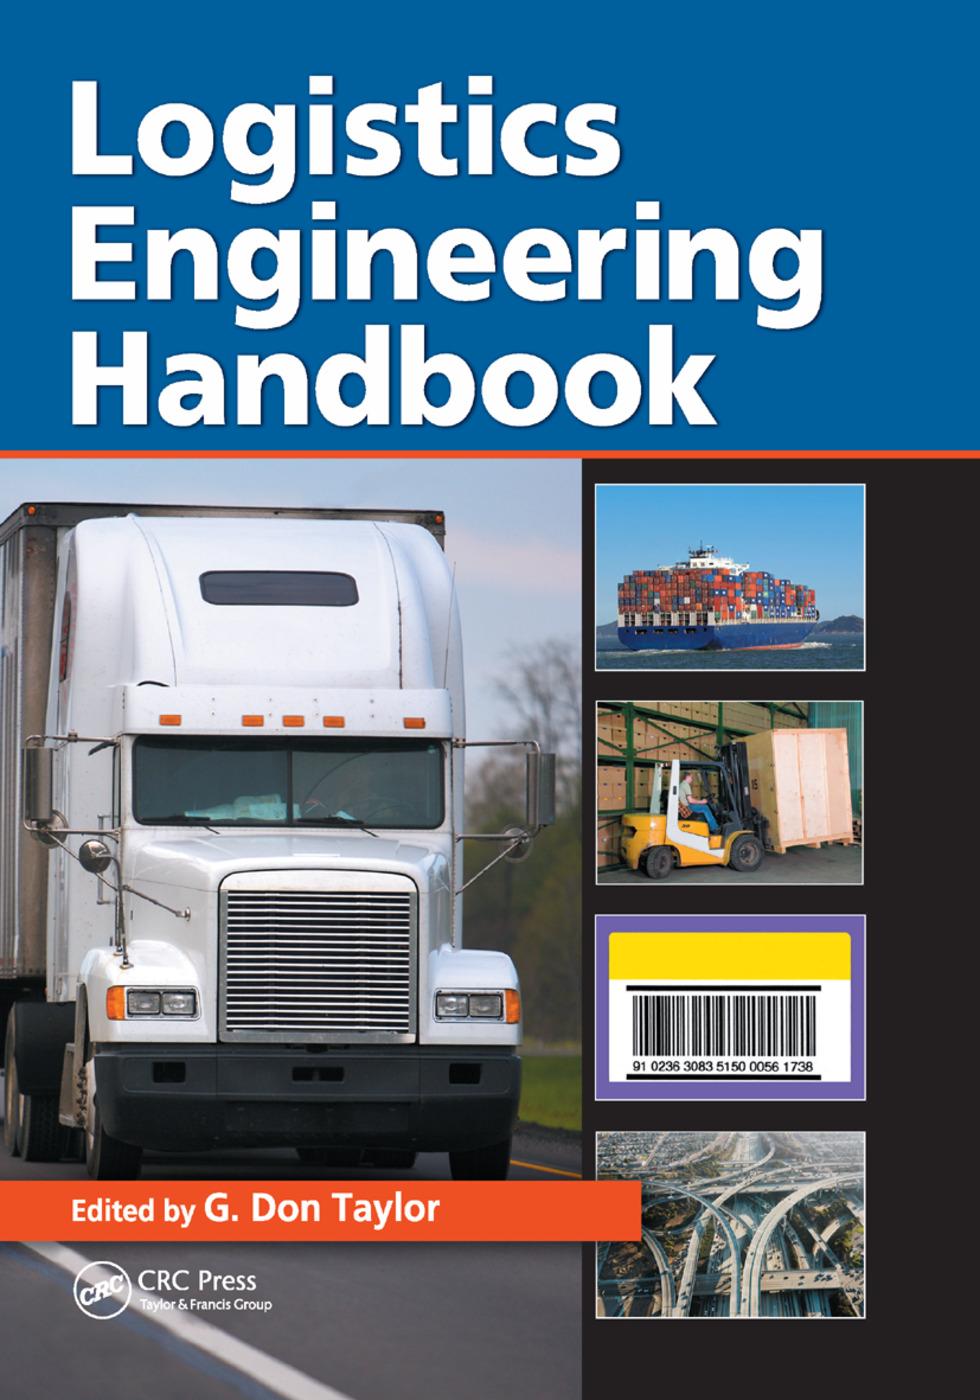 Logistics Engineering Handbook: 1st Edition (Paperback) book cover